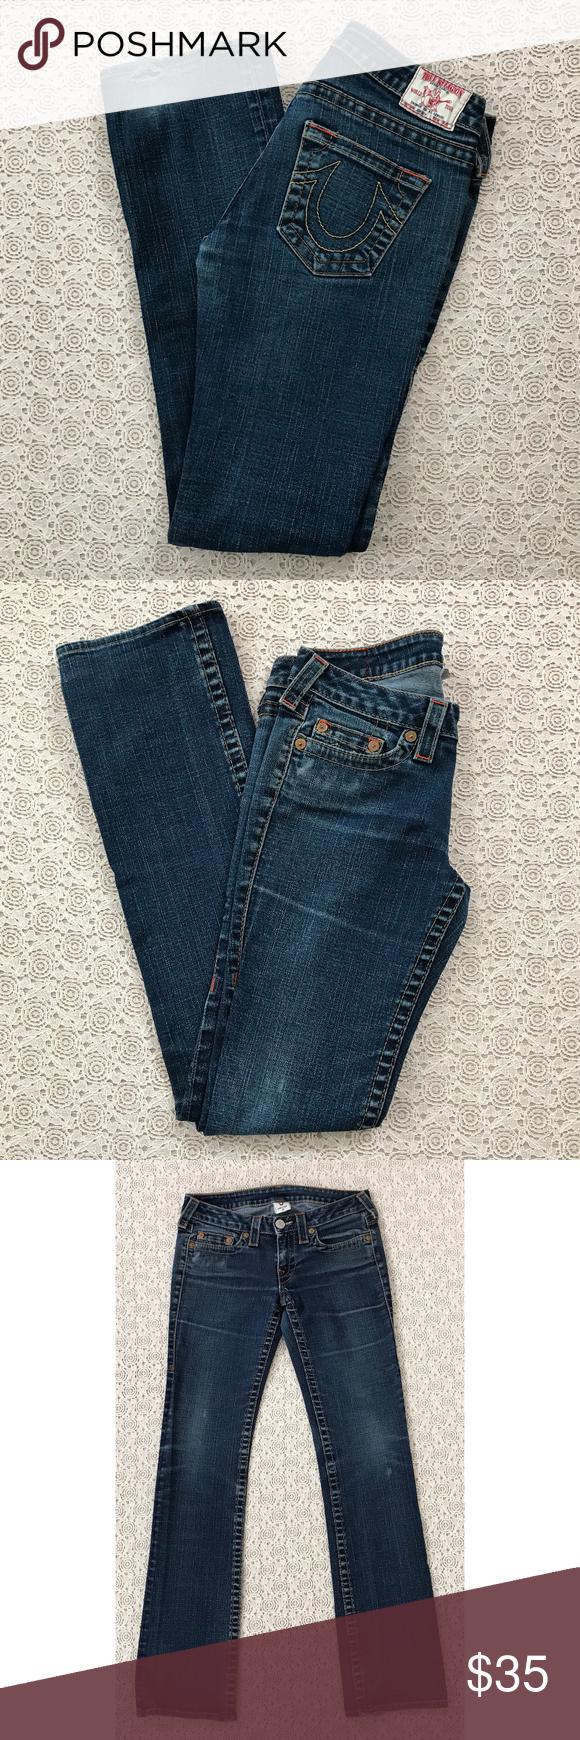 cf85267073e3f1 True Religion Johnny Straight Leg Jeans True Religion Johnny Straight Leg  Jeans with Orange Stitching • Measurements taken laid flat …